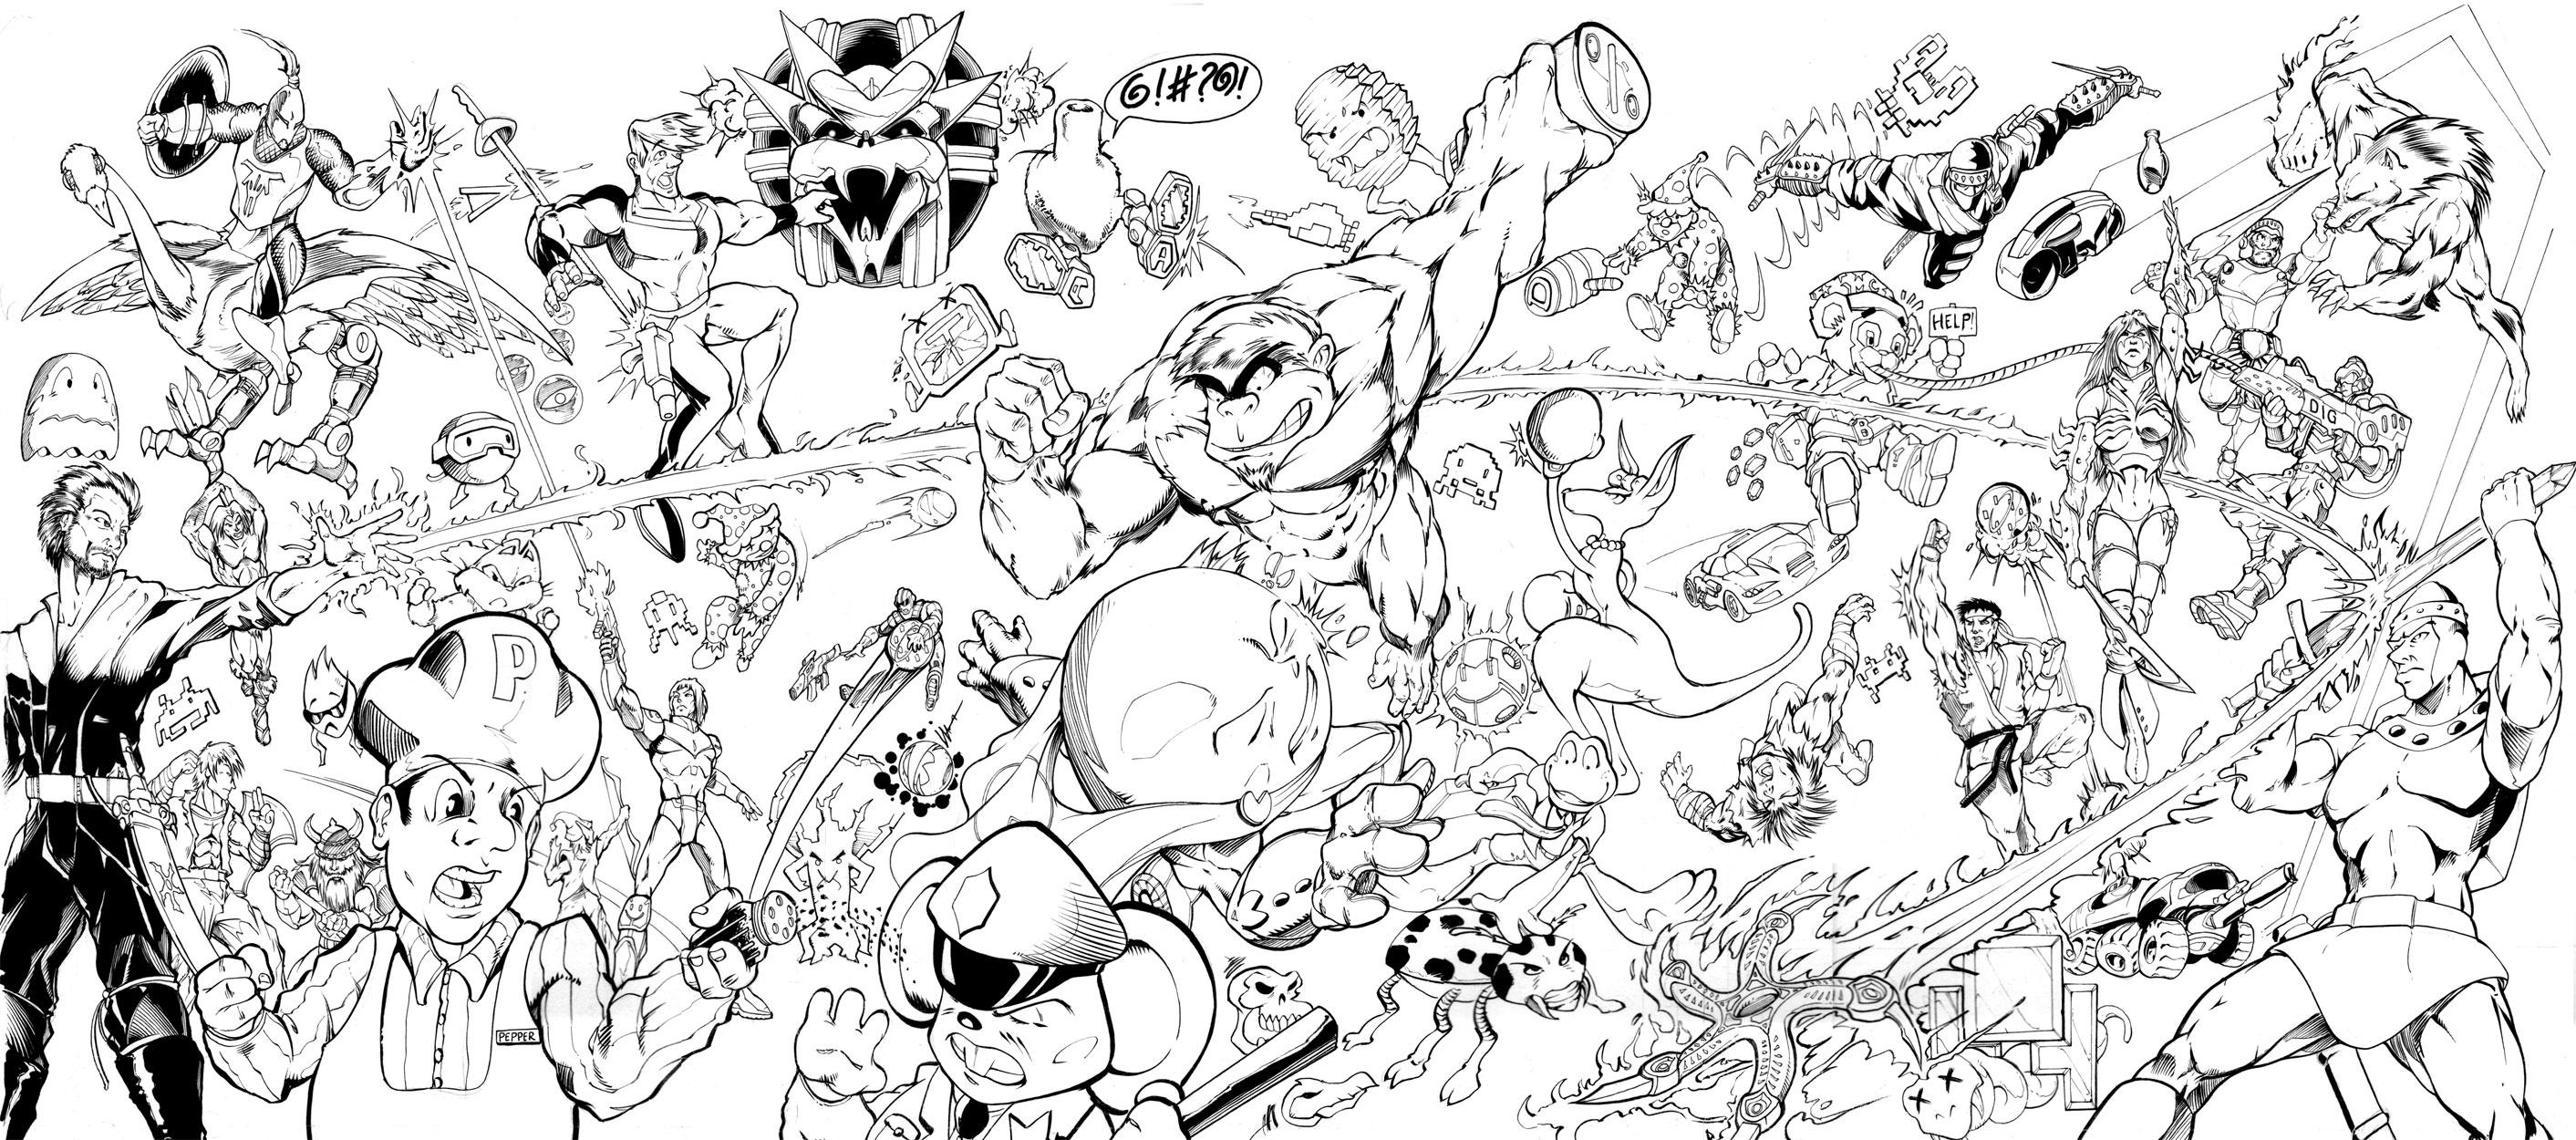 Super smash bros the 80s by inker guy on deviantart for Super smash bros brawl coloring pages